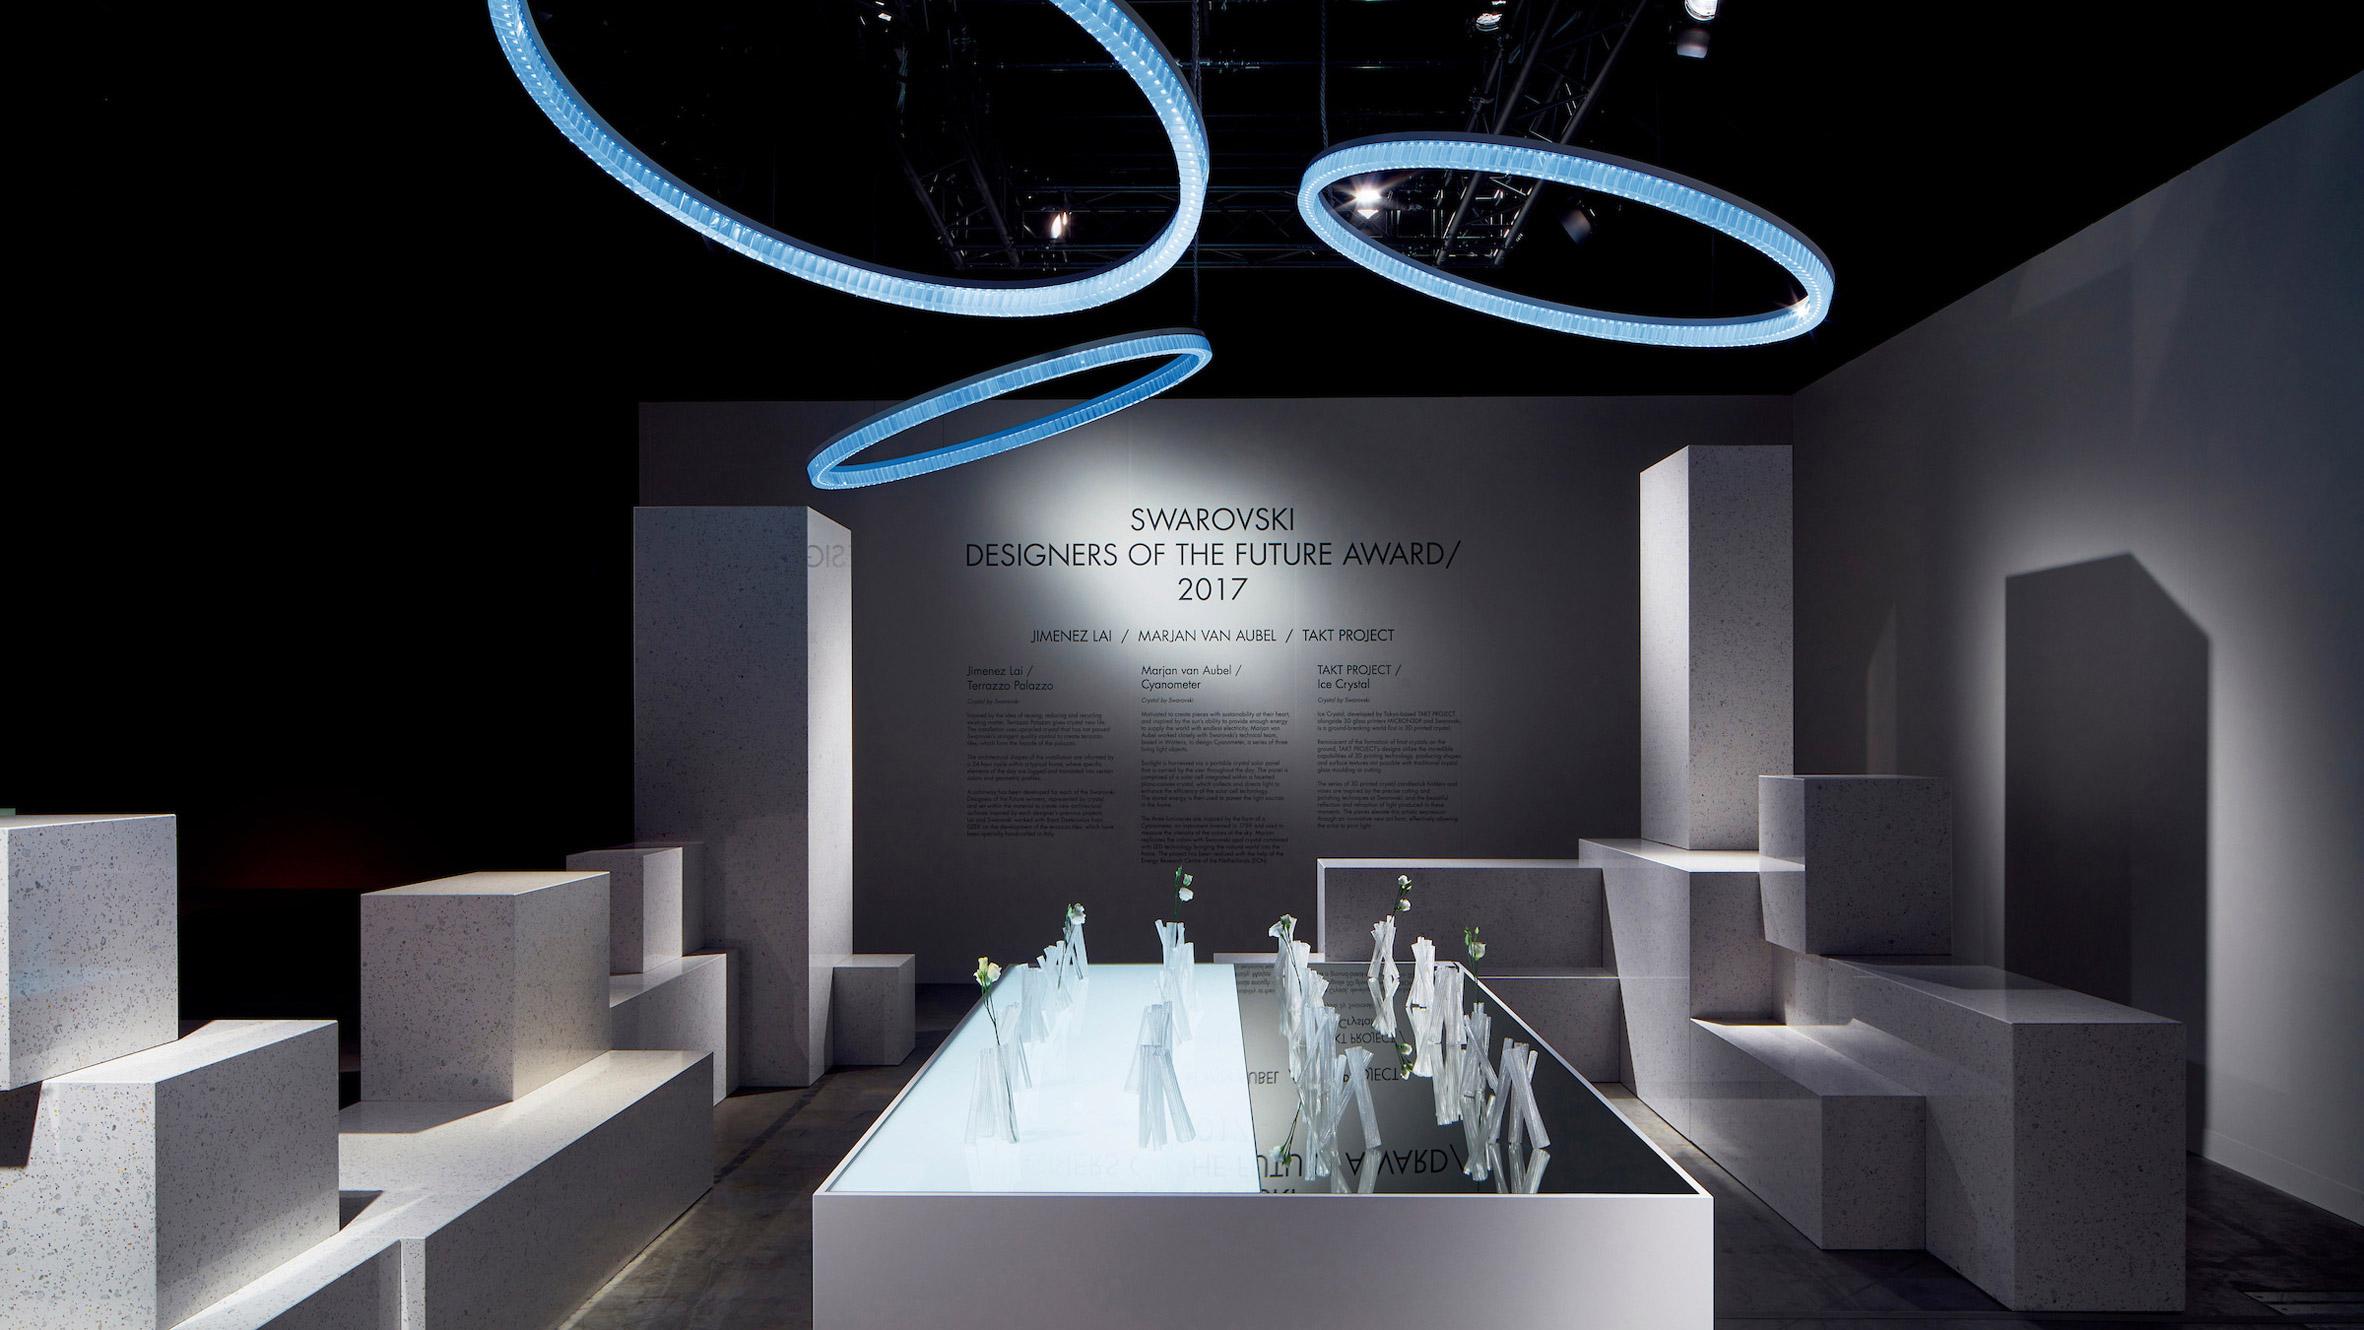 Swarovski Designers of the Future